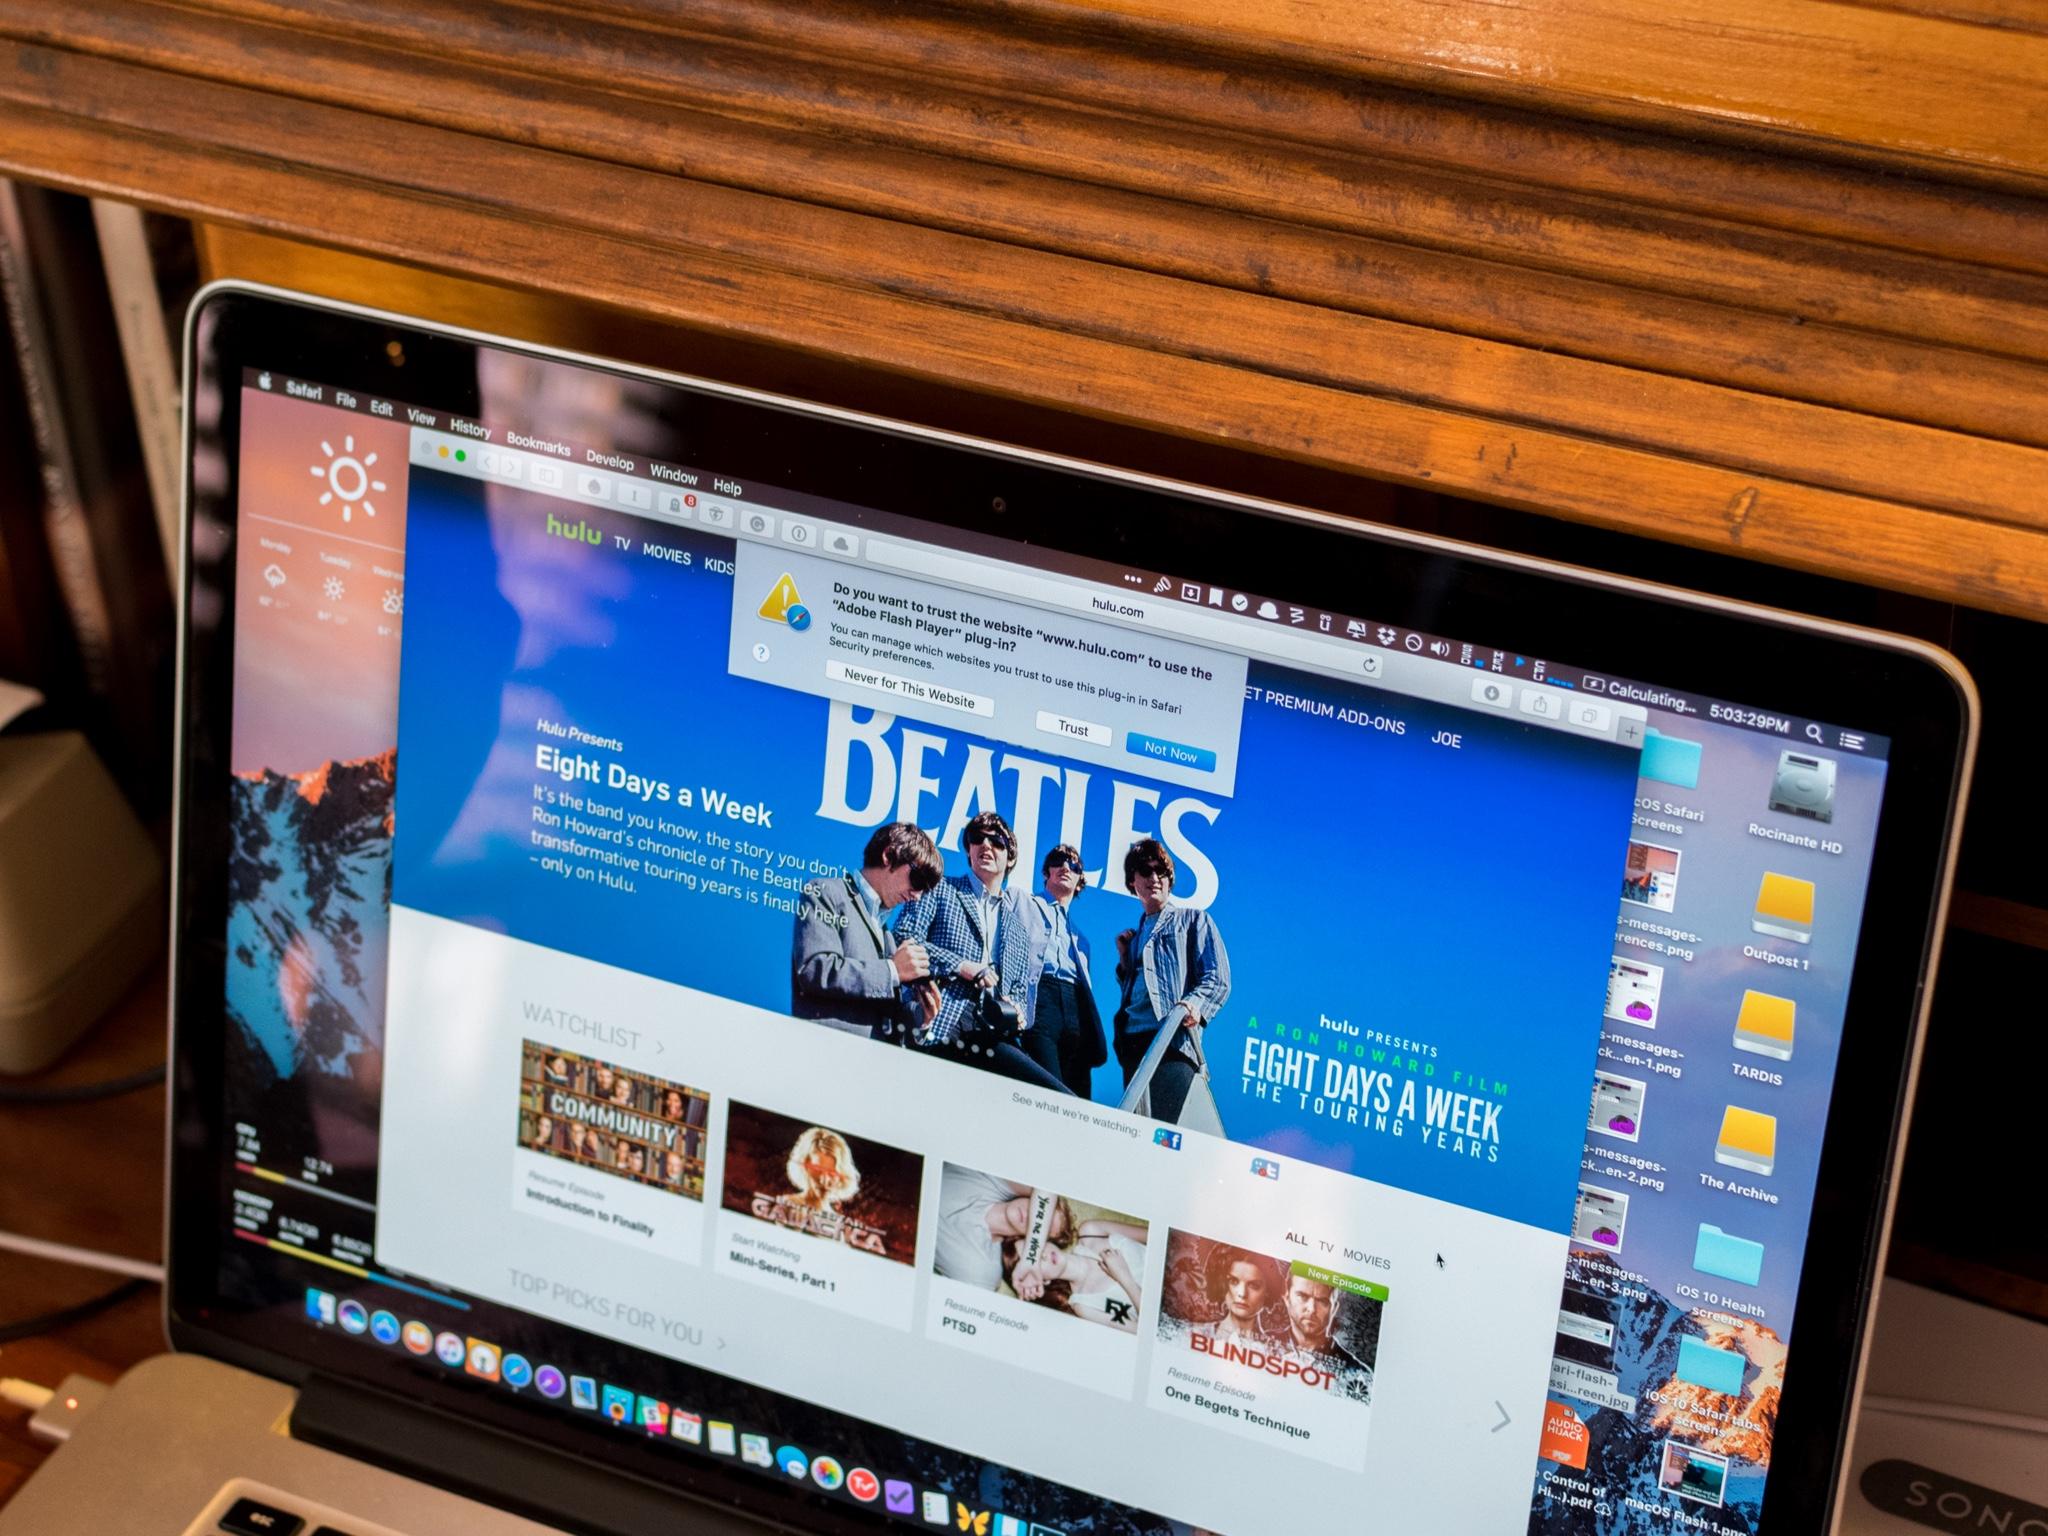 How Flash Works With Safari 10 In Macos Sierra